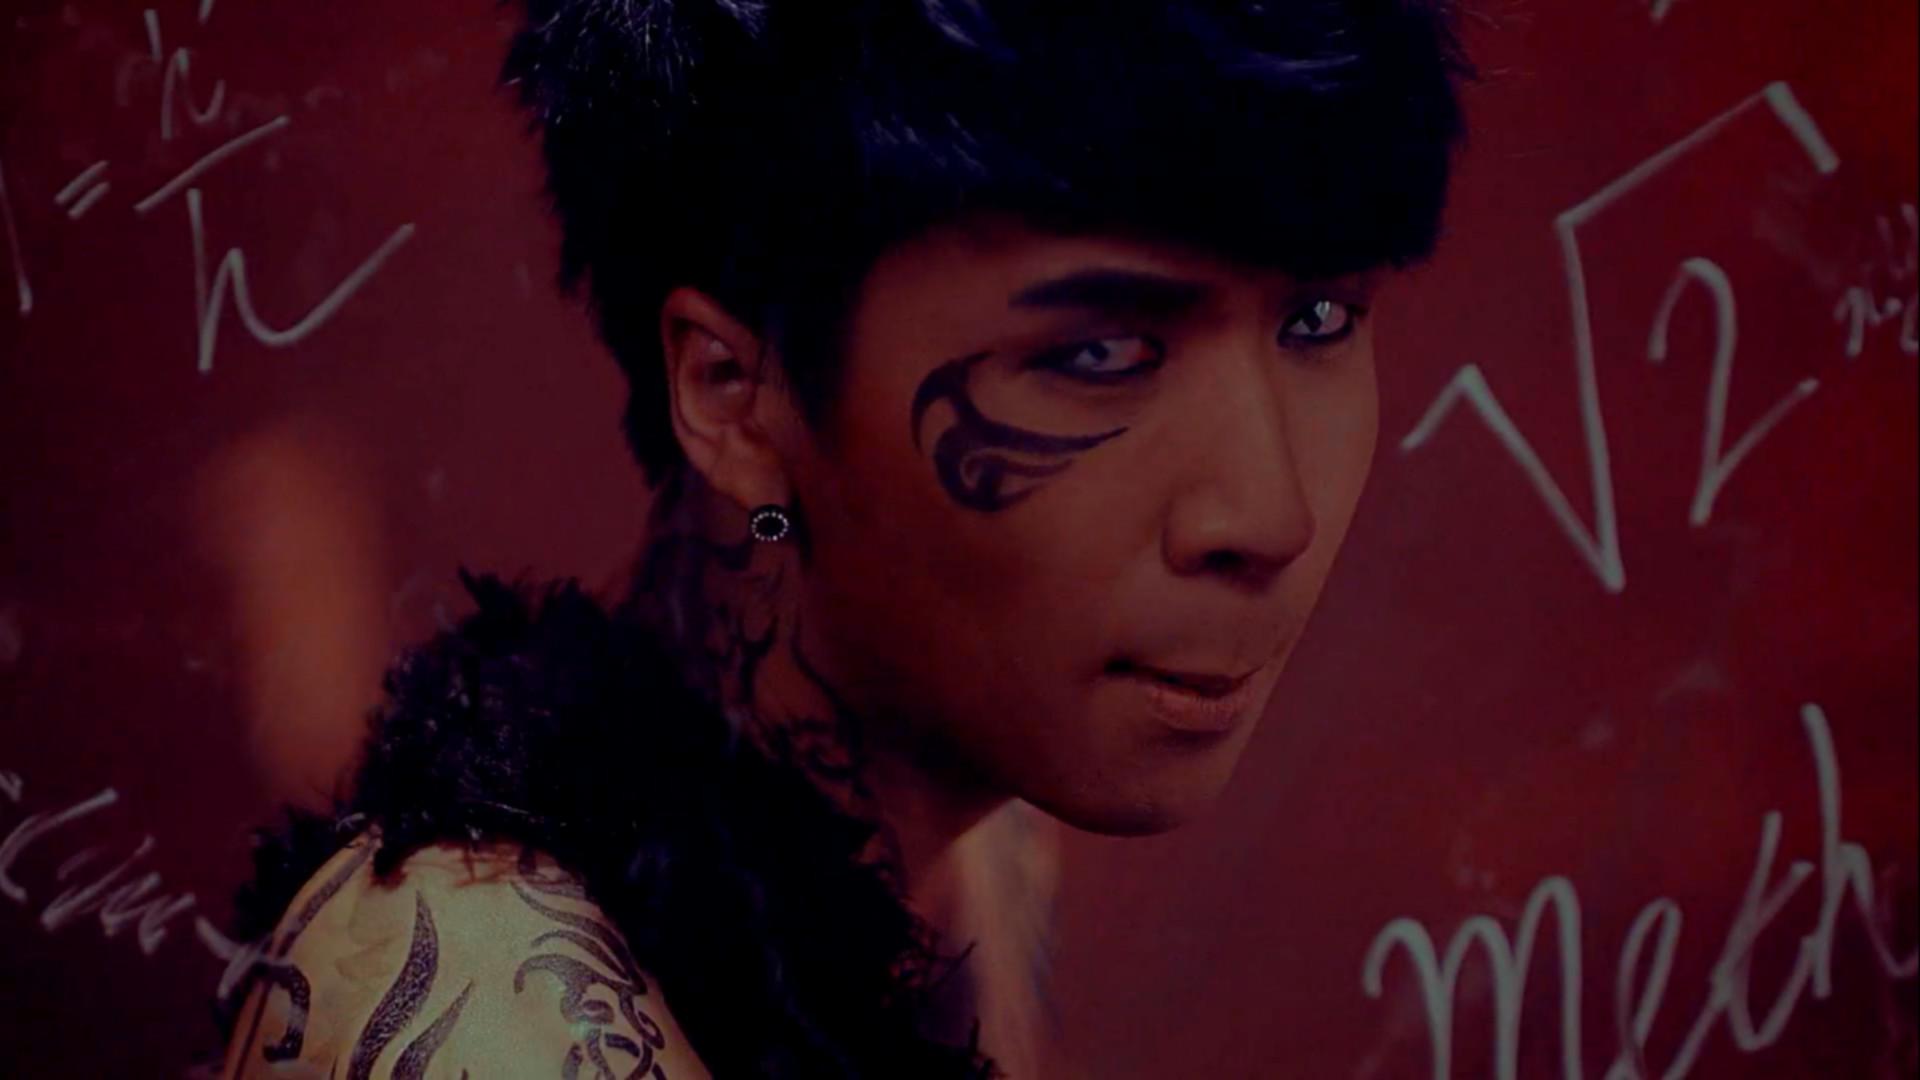 Vixx Voodoo Doll Ravi VIXX - Voodoo Doll who...